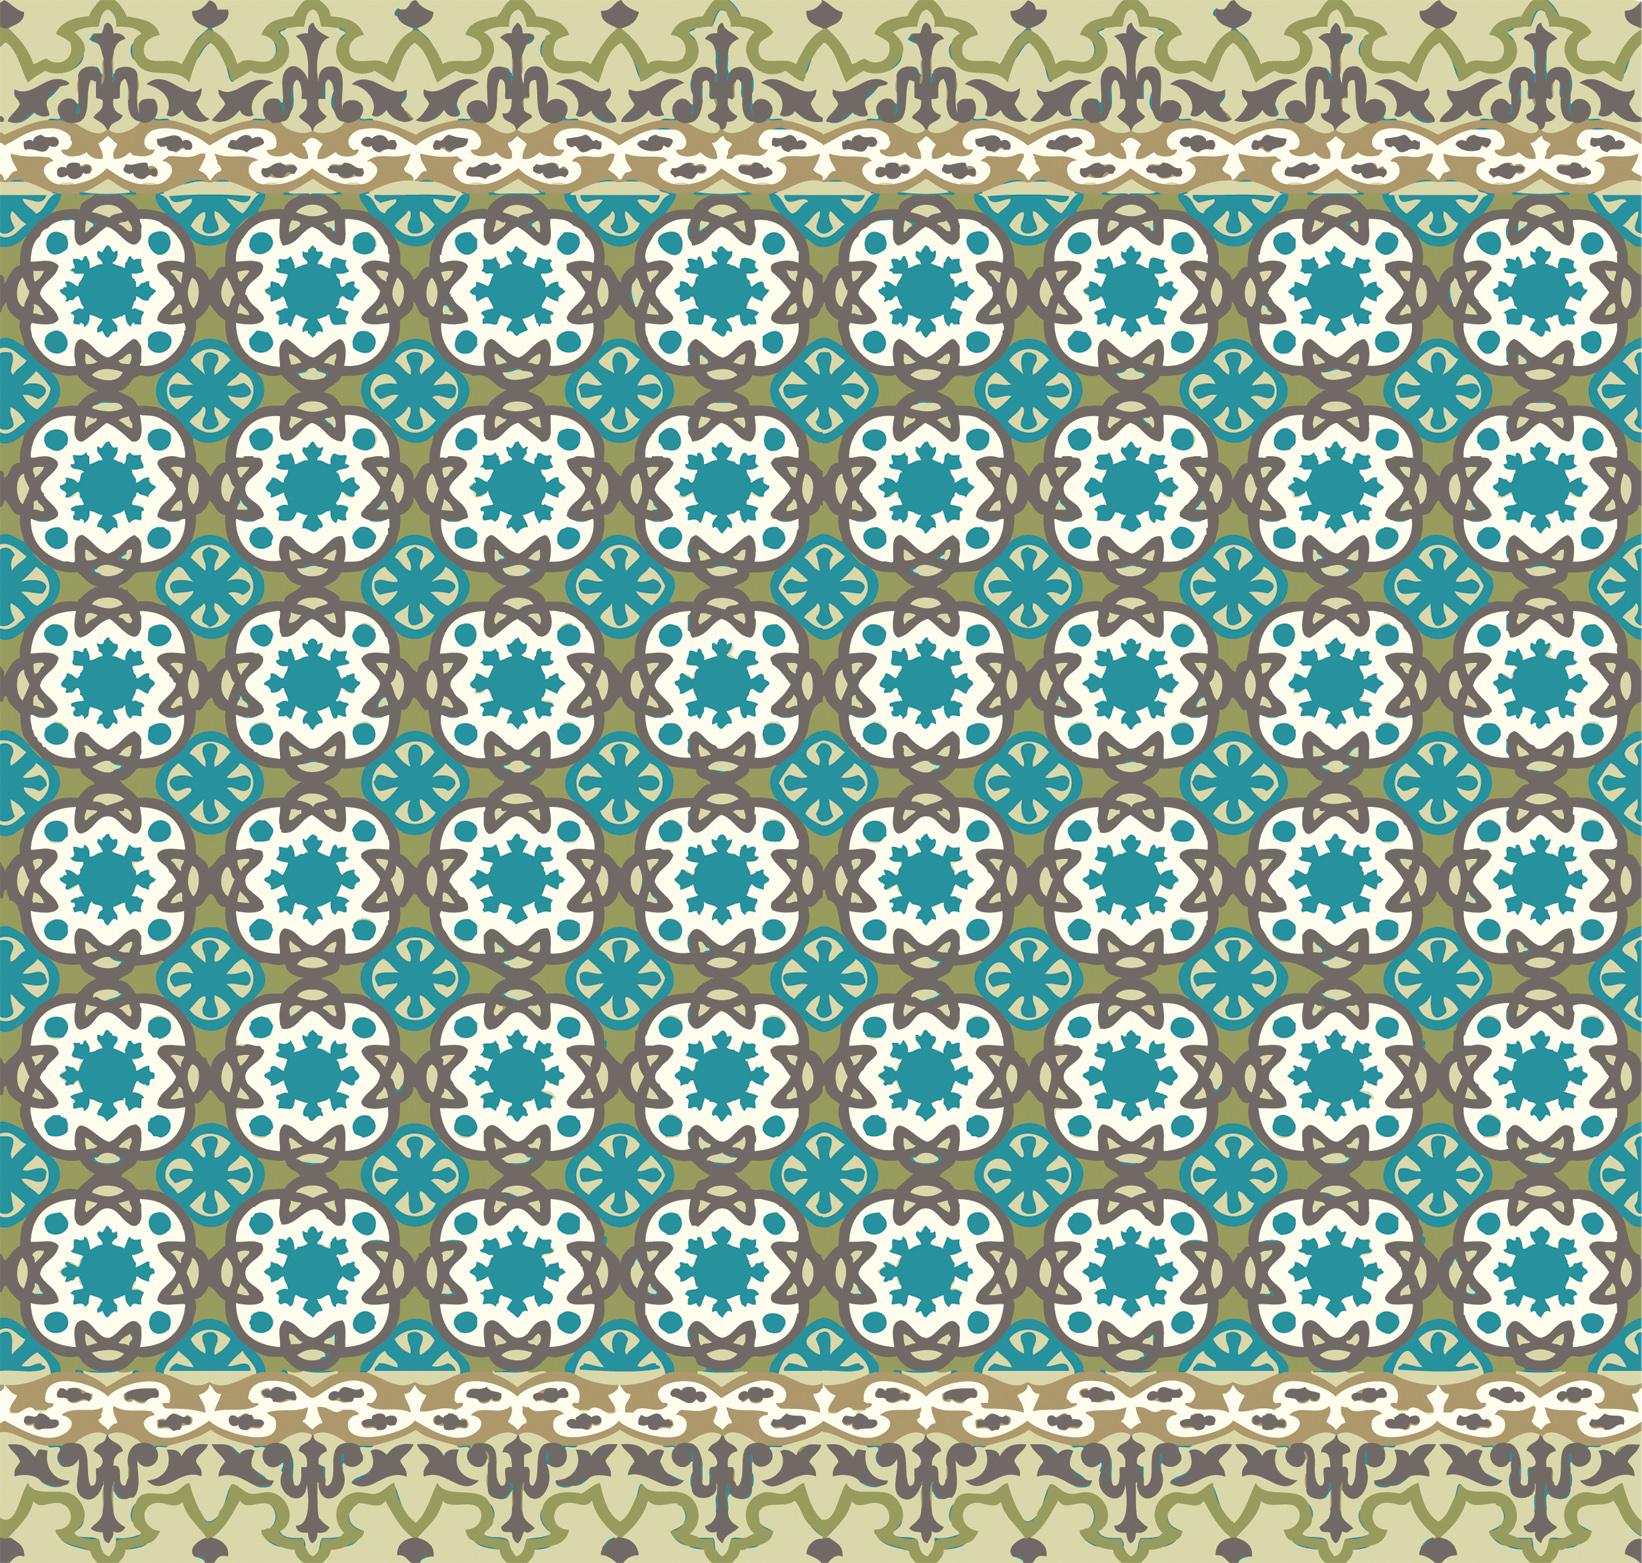 Moroccan Design Allover Pattern Designs By Melissa Jefferson At Coroflotcom